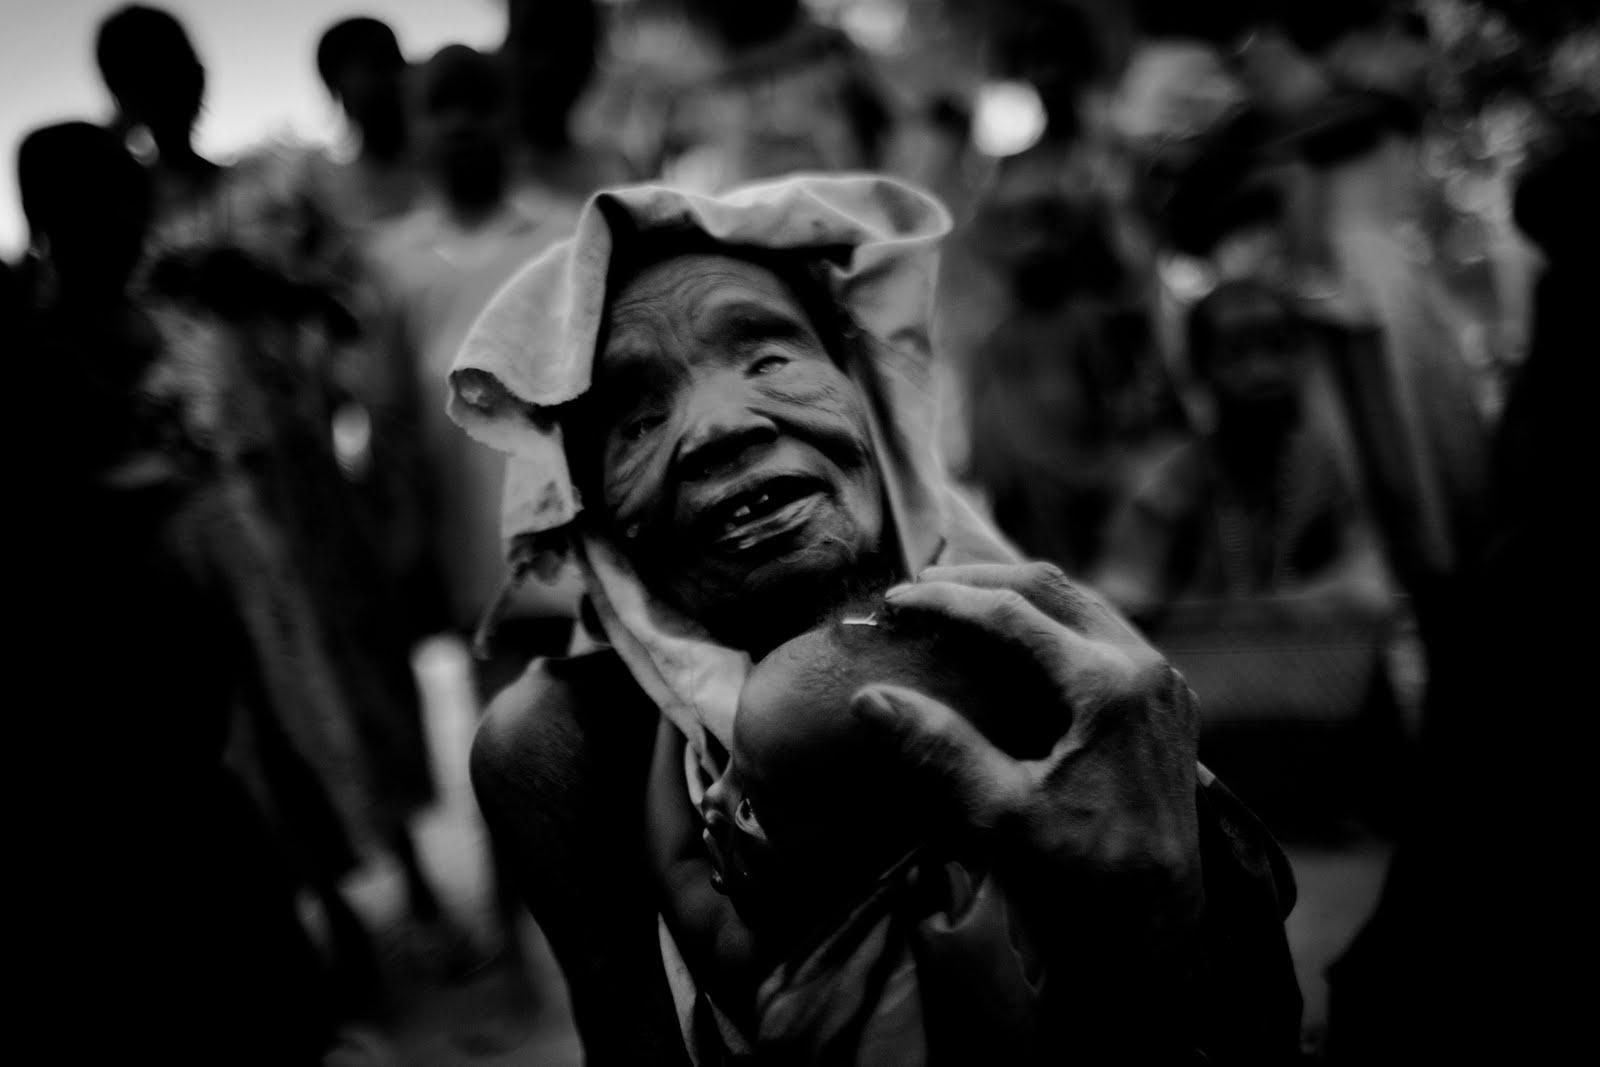 Нищие. Фото Ян Граруп (Jan Grarup)